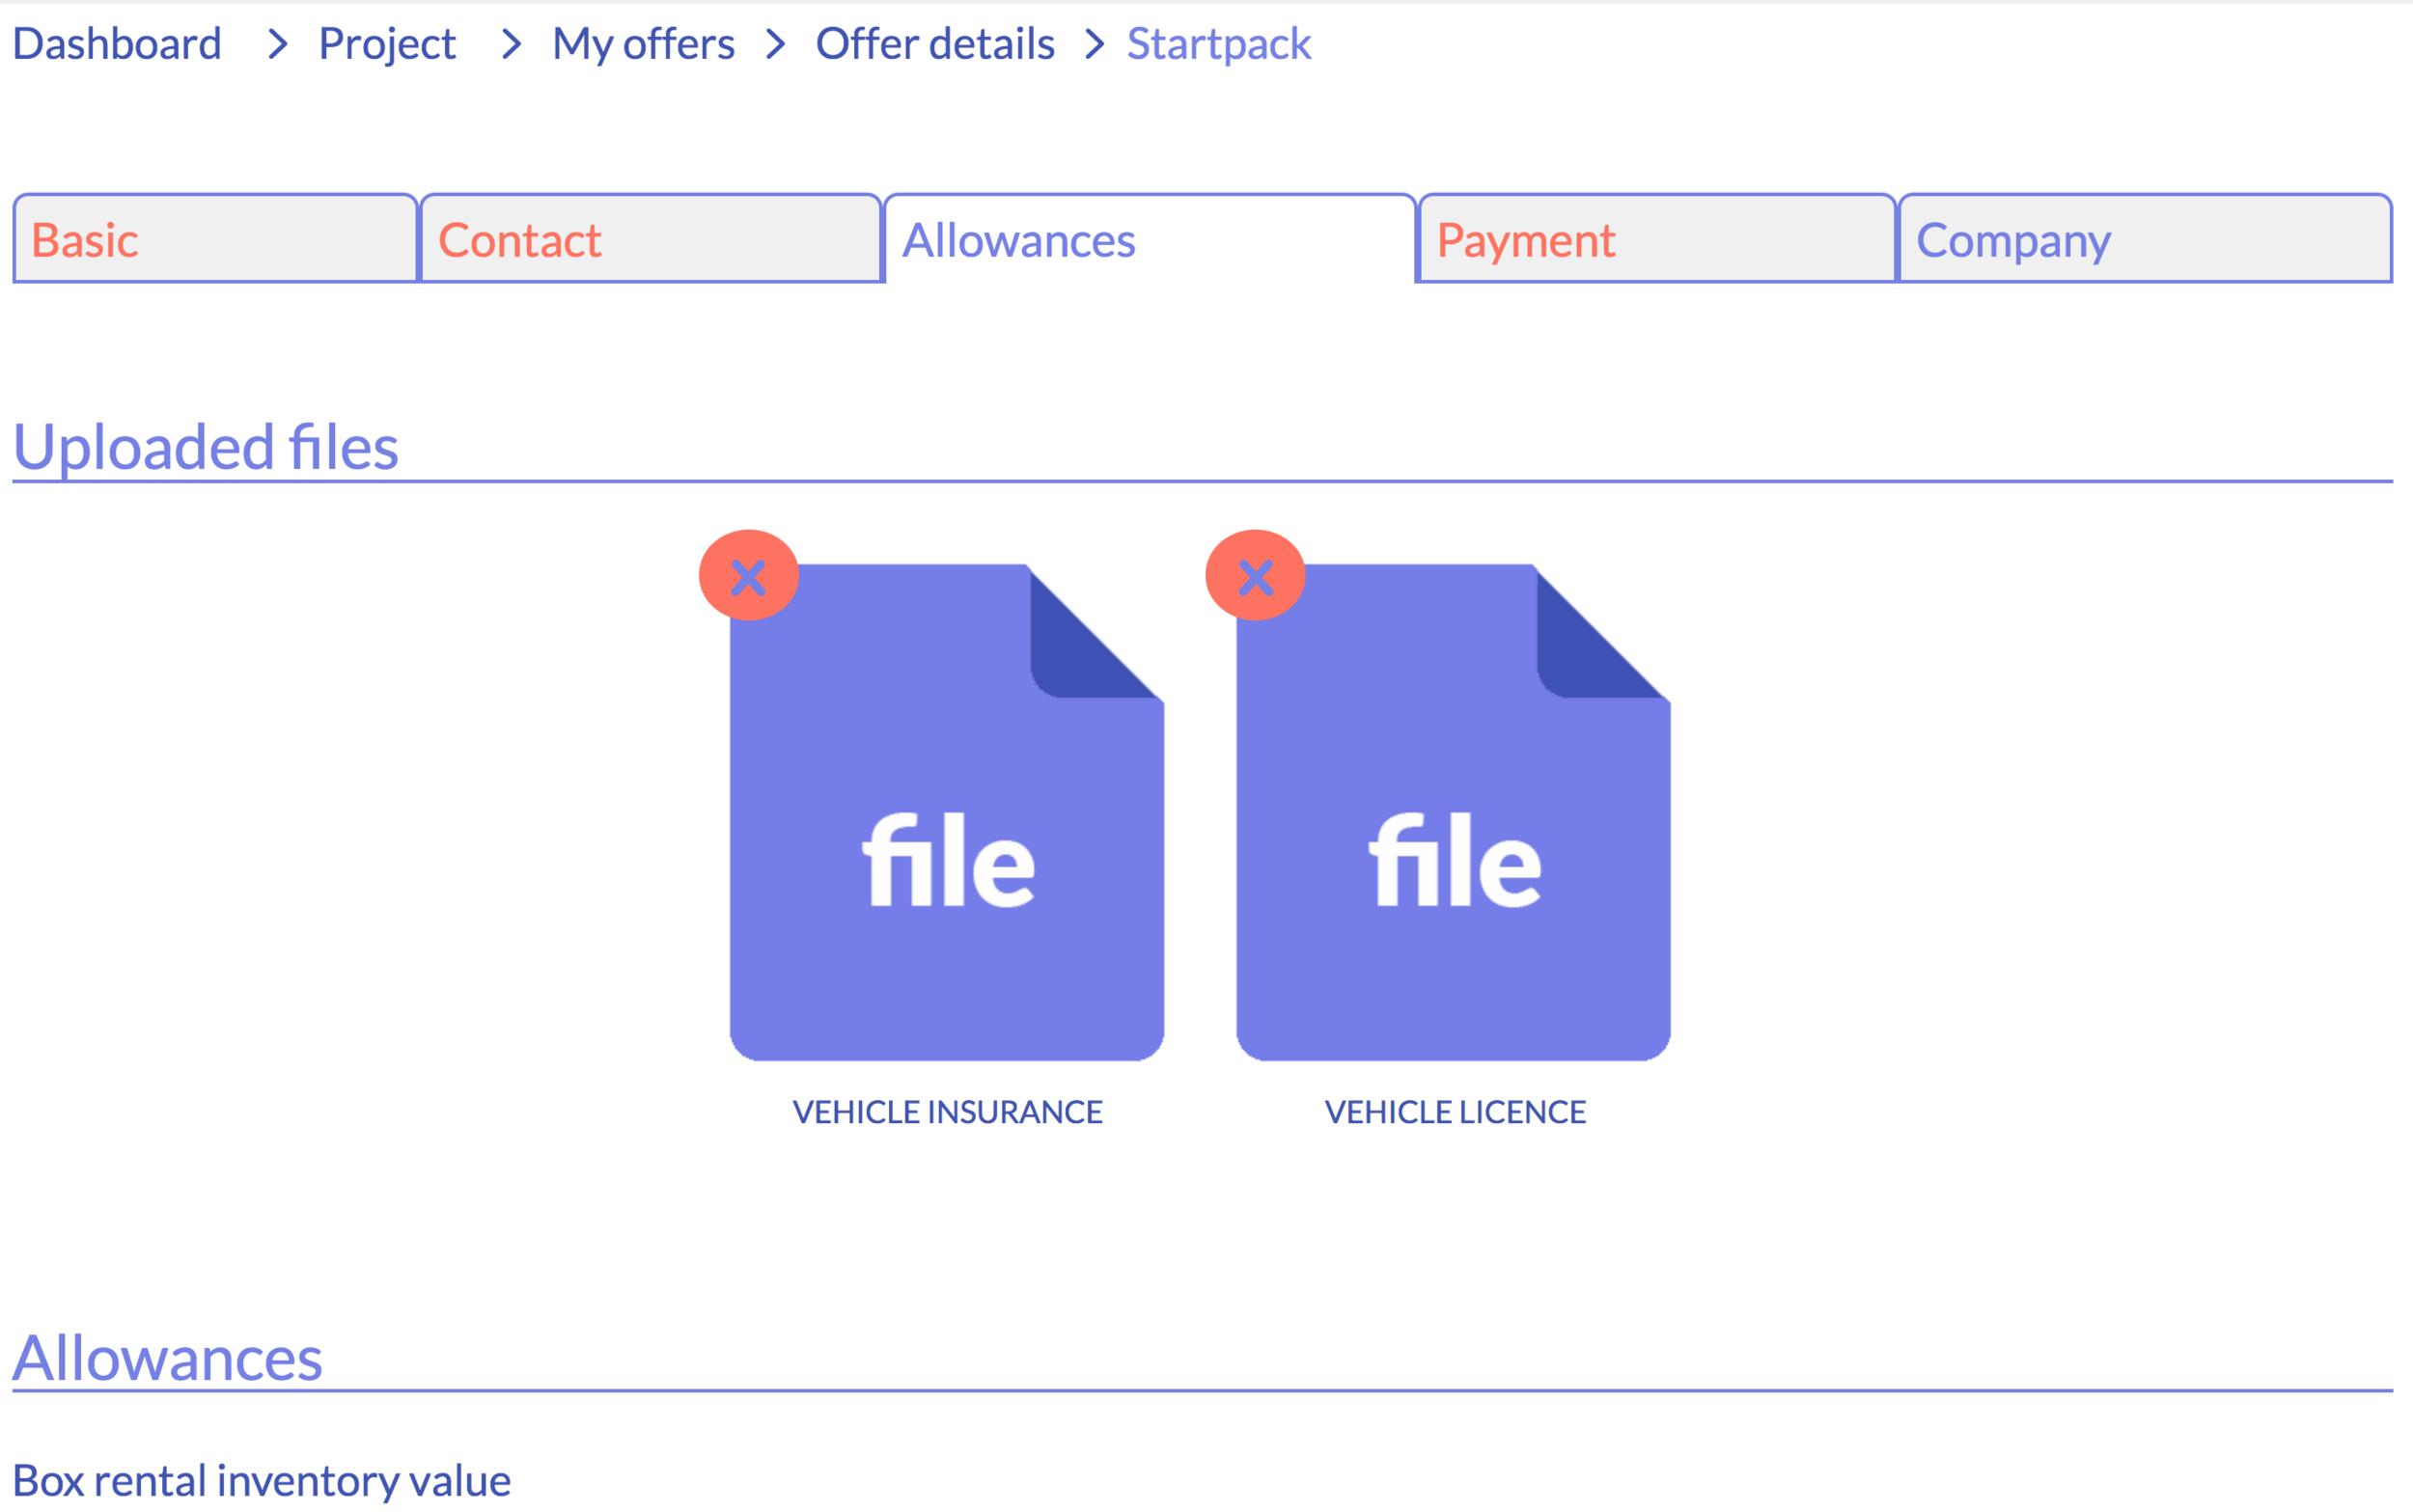 file uploads in startpack